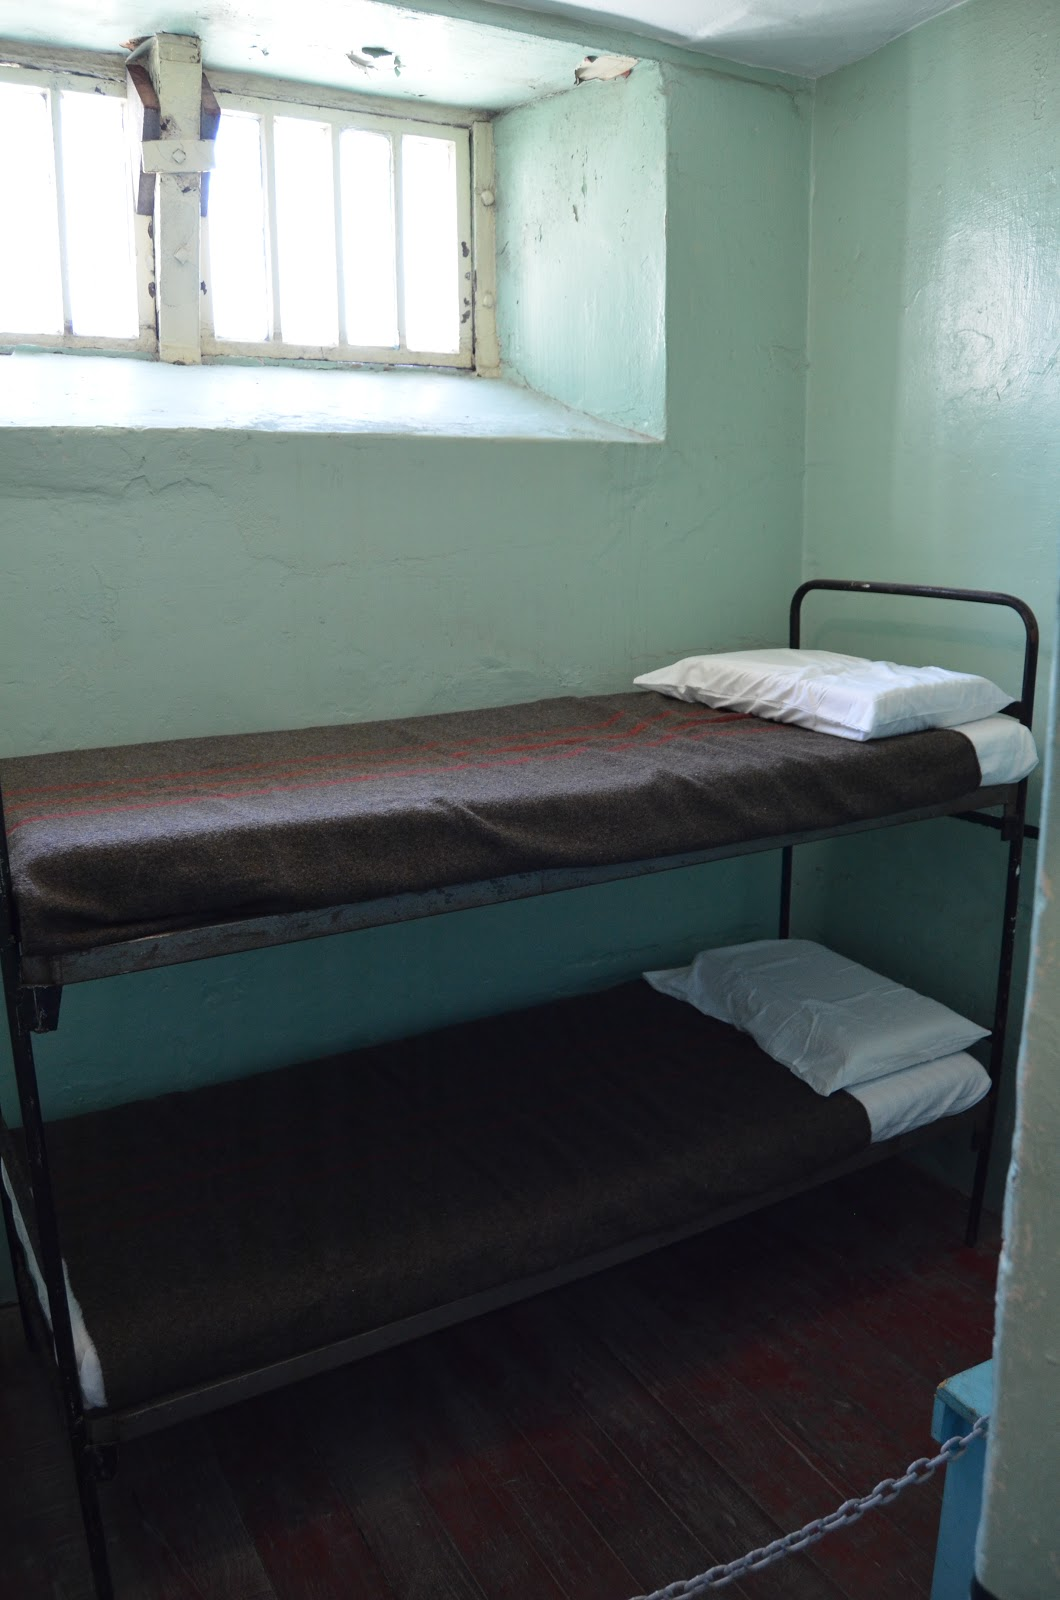 Fremantle Prison Tour - Bless This Mess